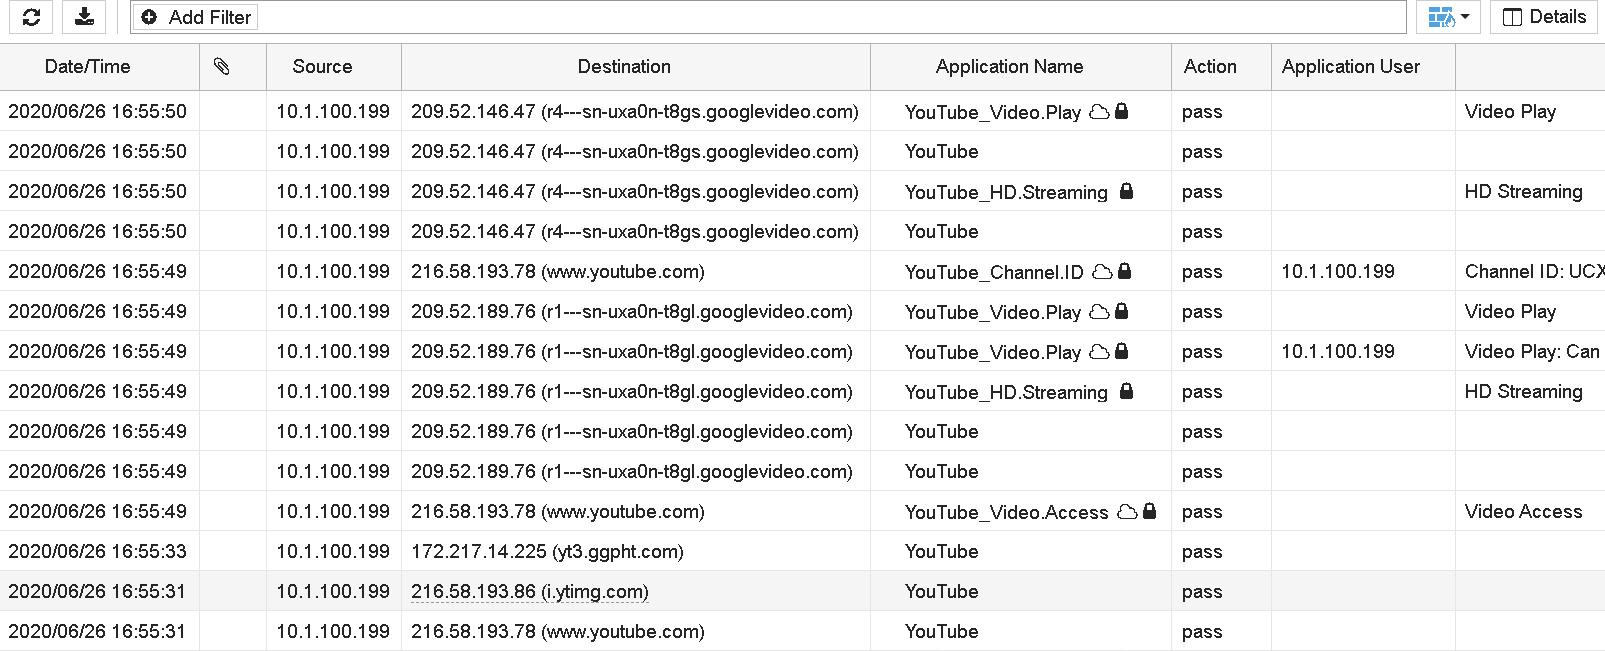 Traffic logs for YouTube